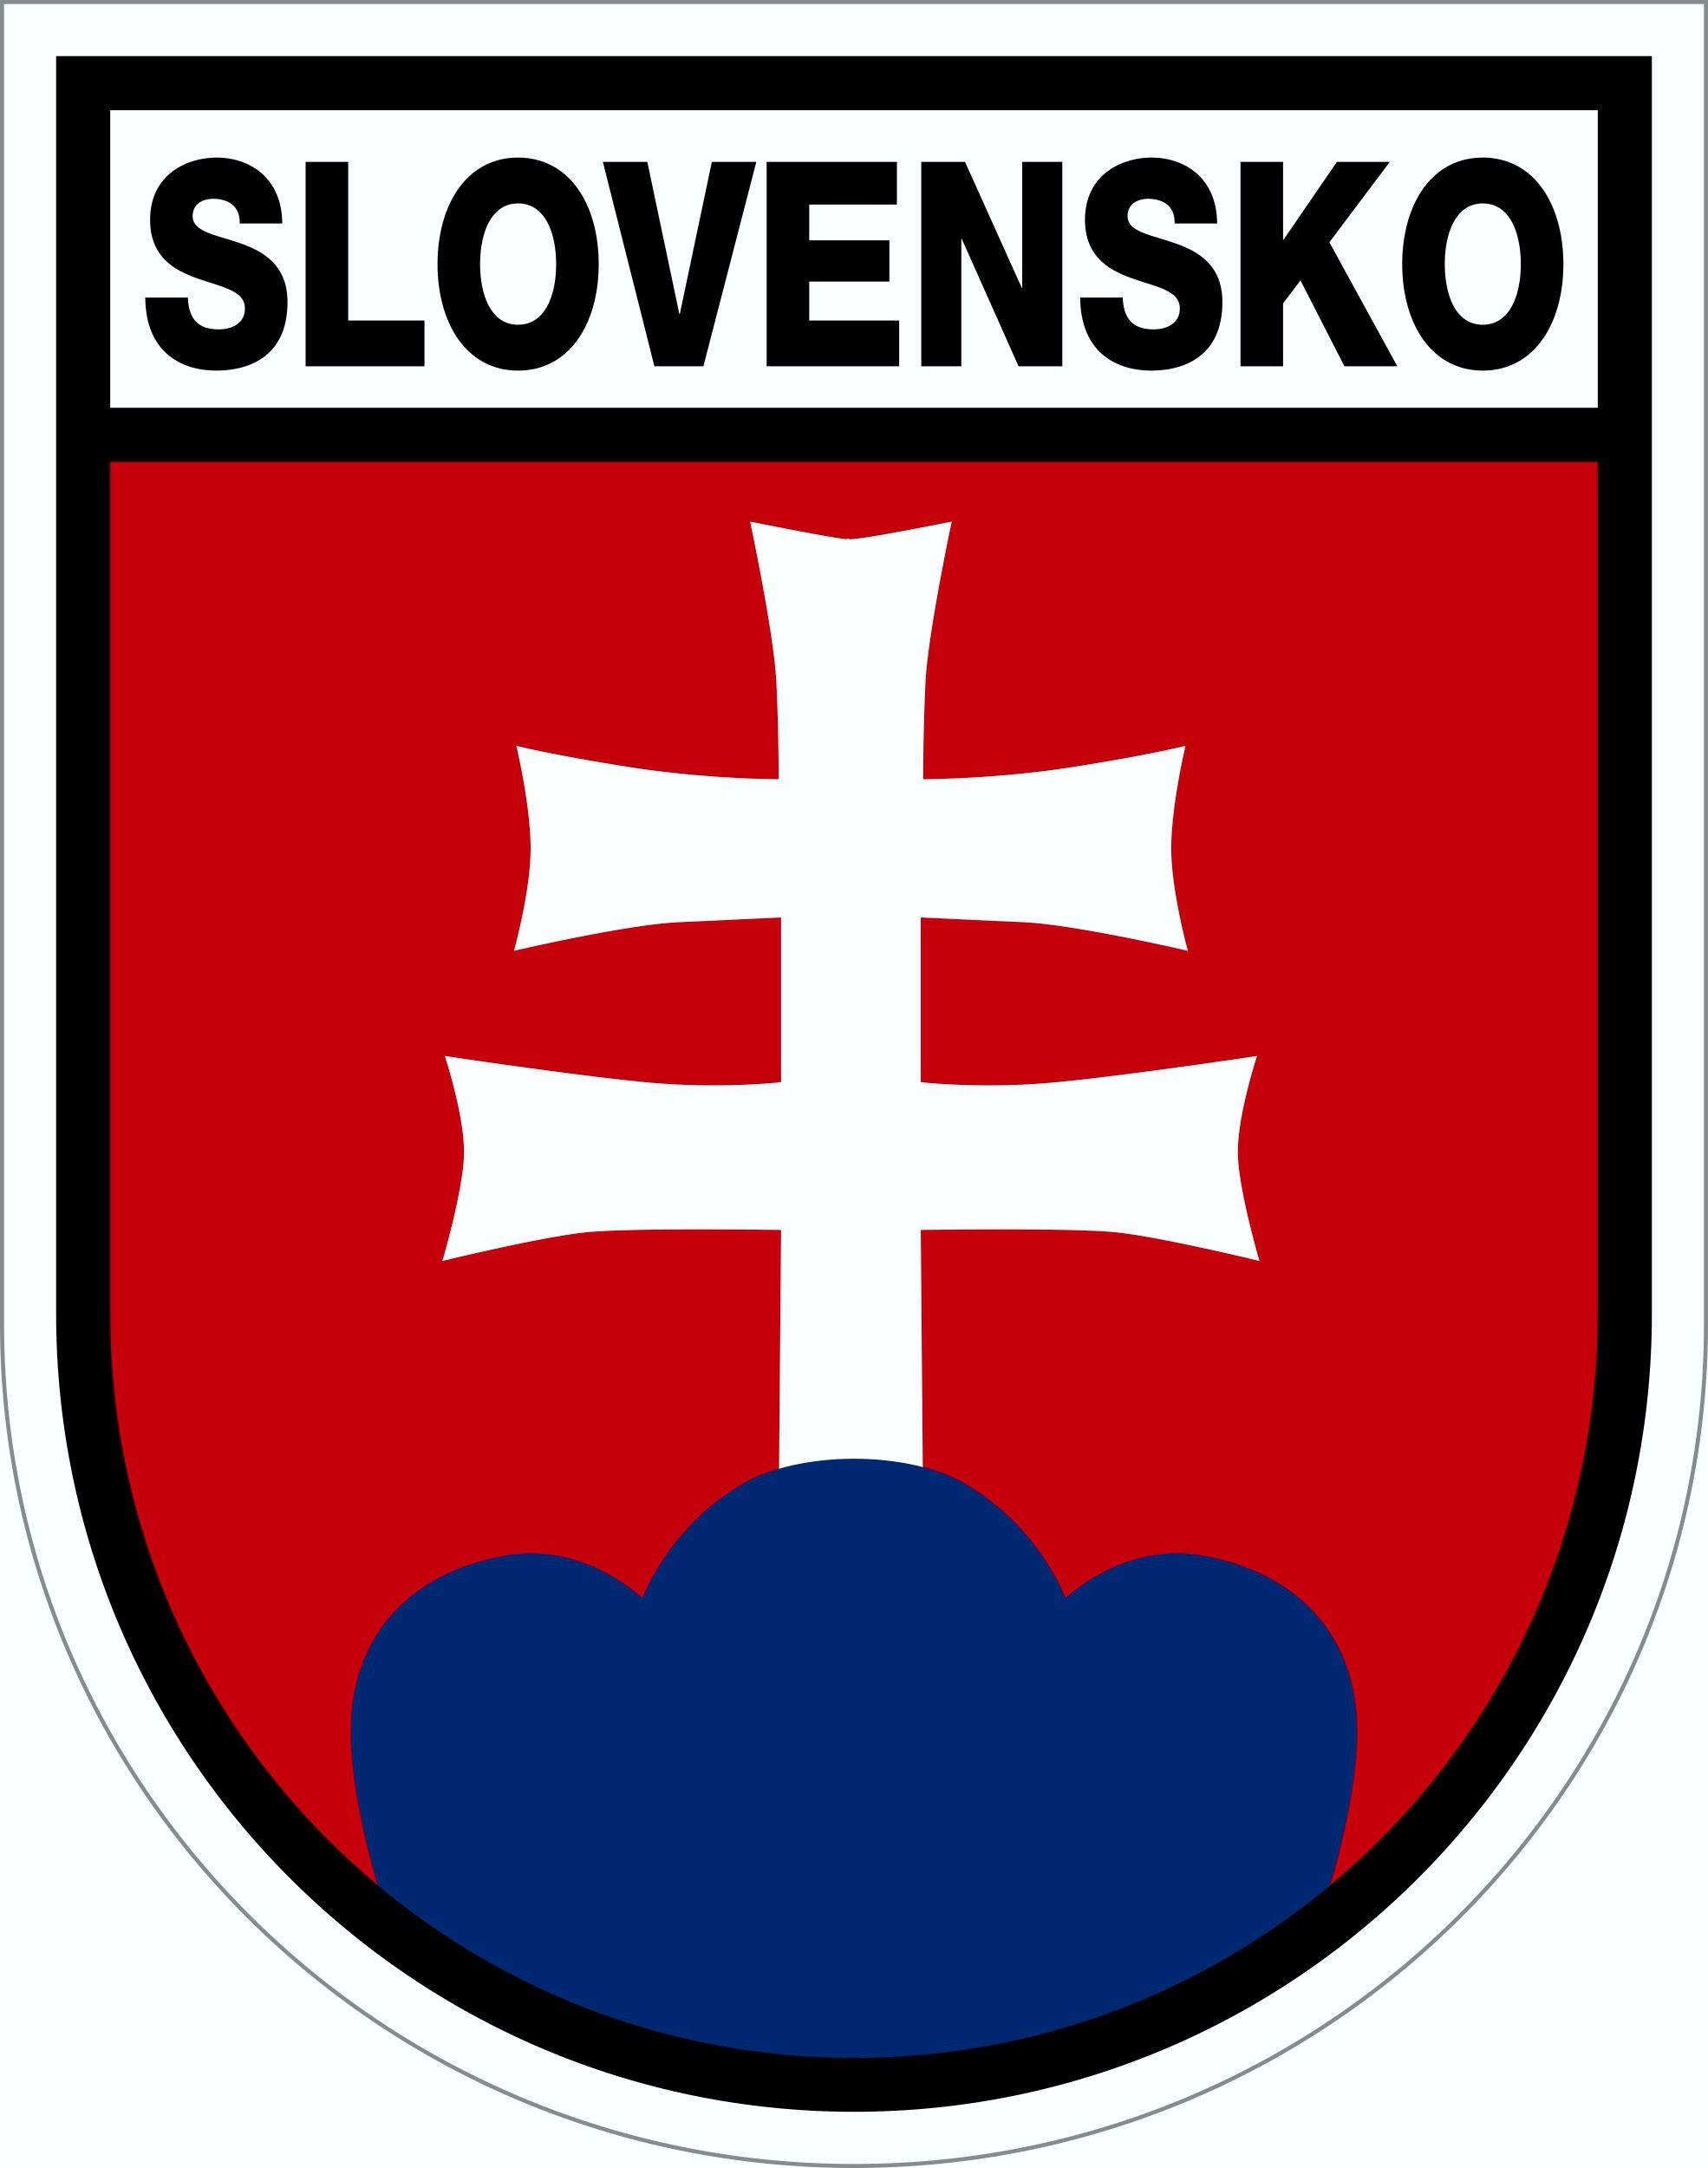 Aufkleber Wappen Slowakei 80 x 65 mm – Bild 1